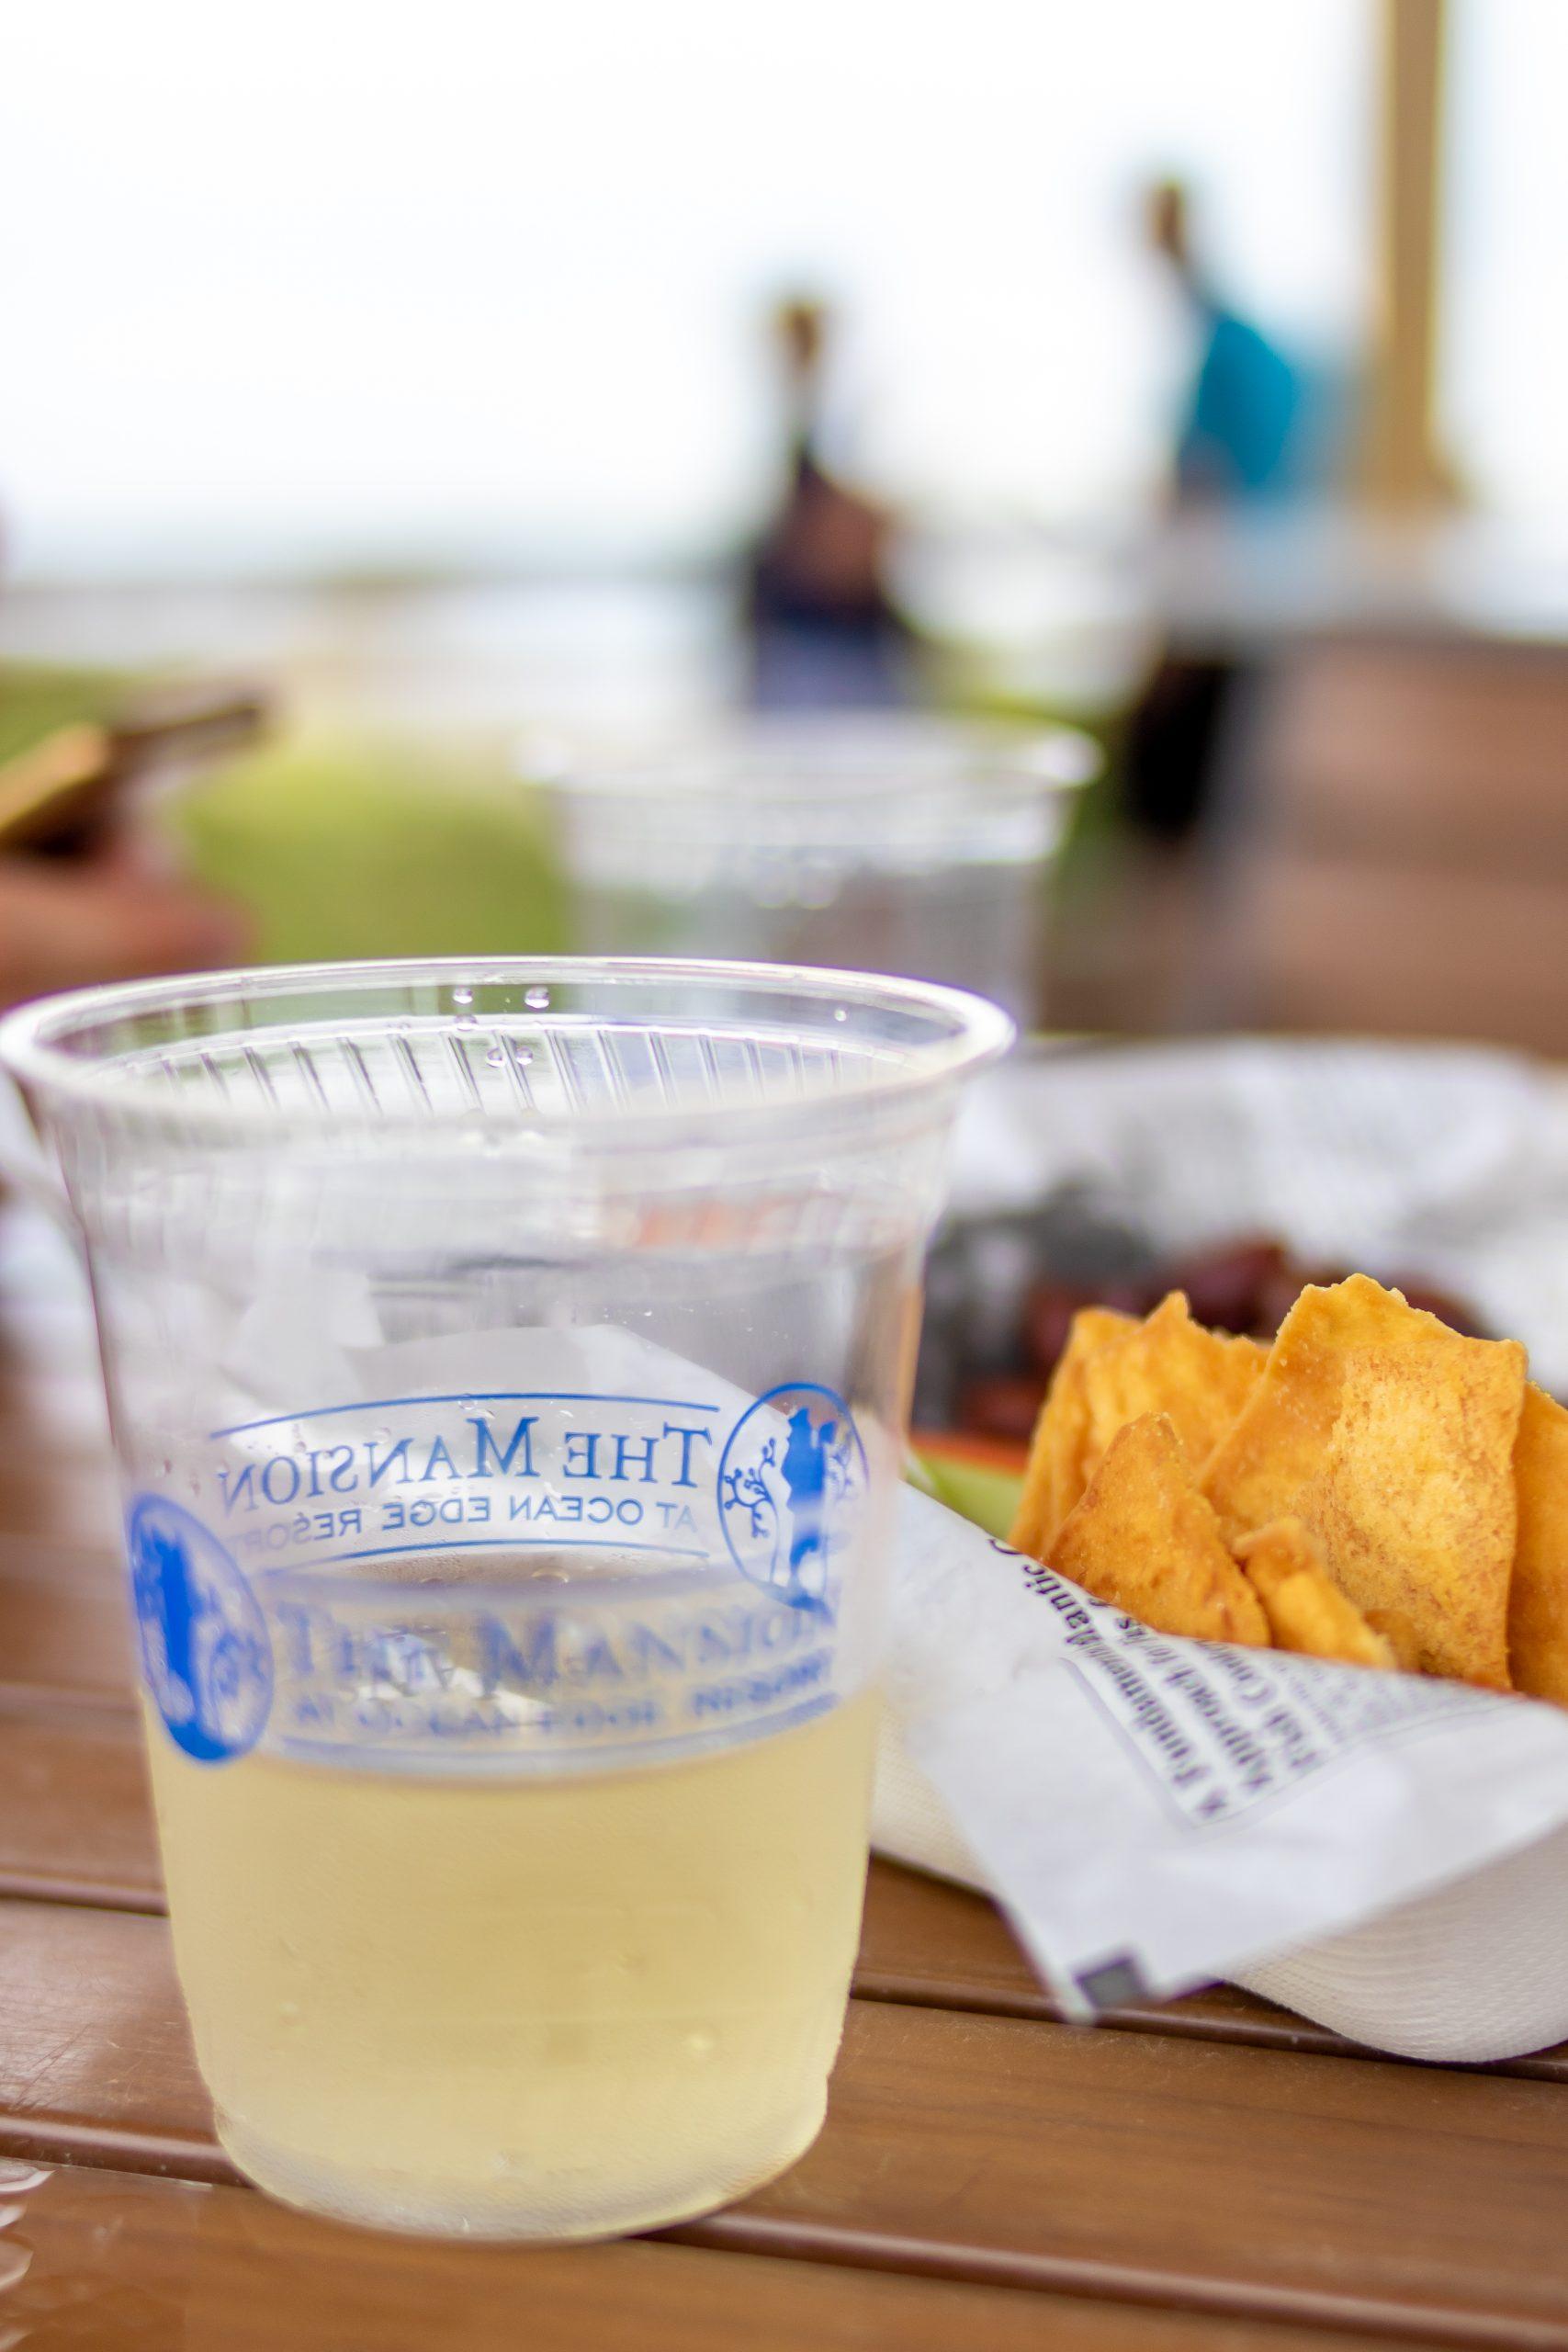 wine and hummus plate at beach bar